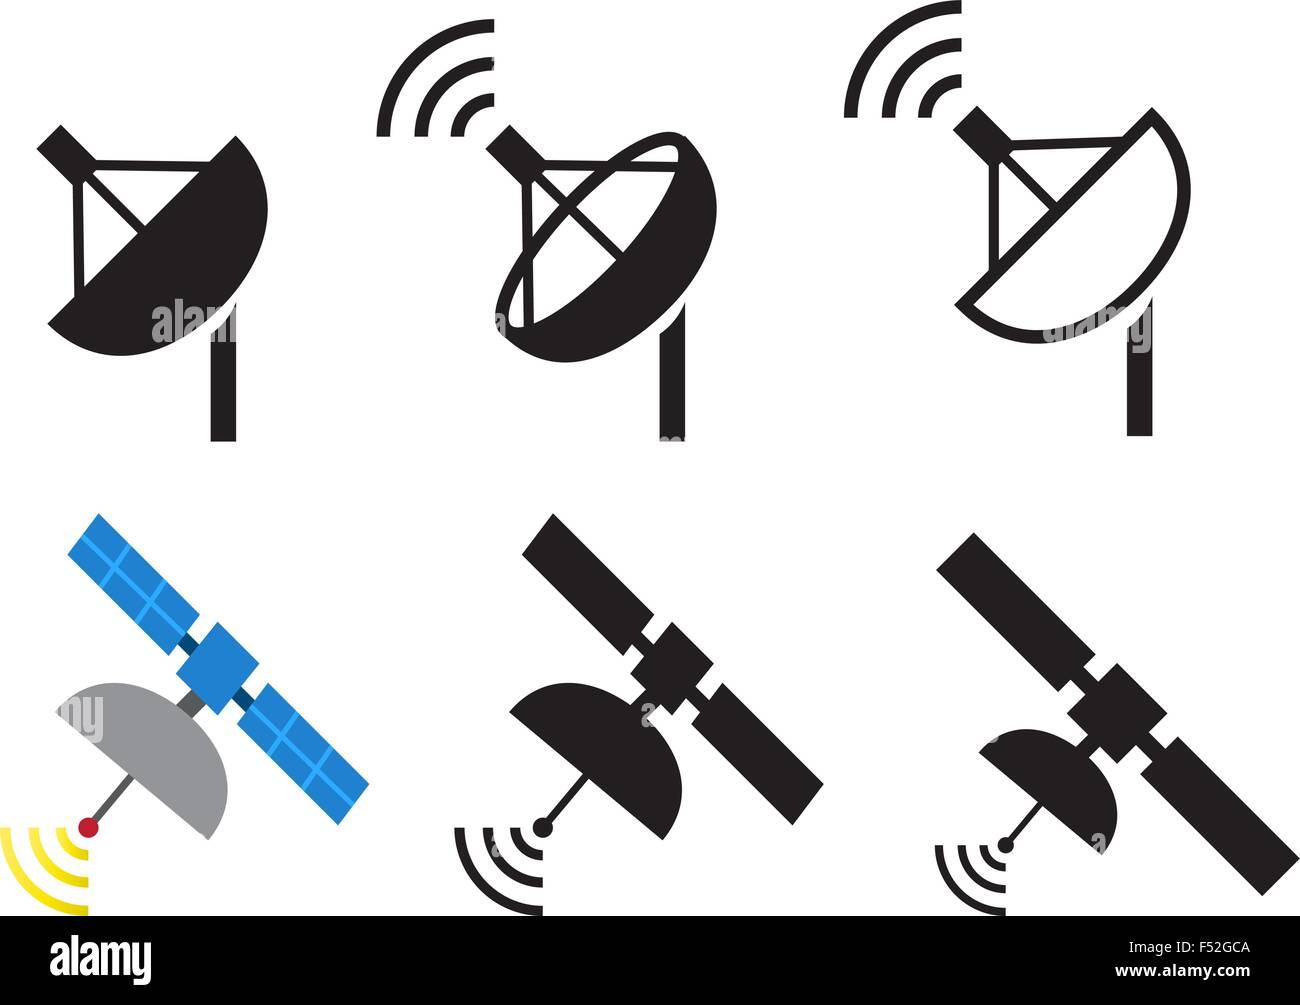 Set of satellite icons, Vector illustration - Stock Image